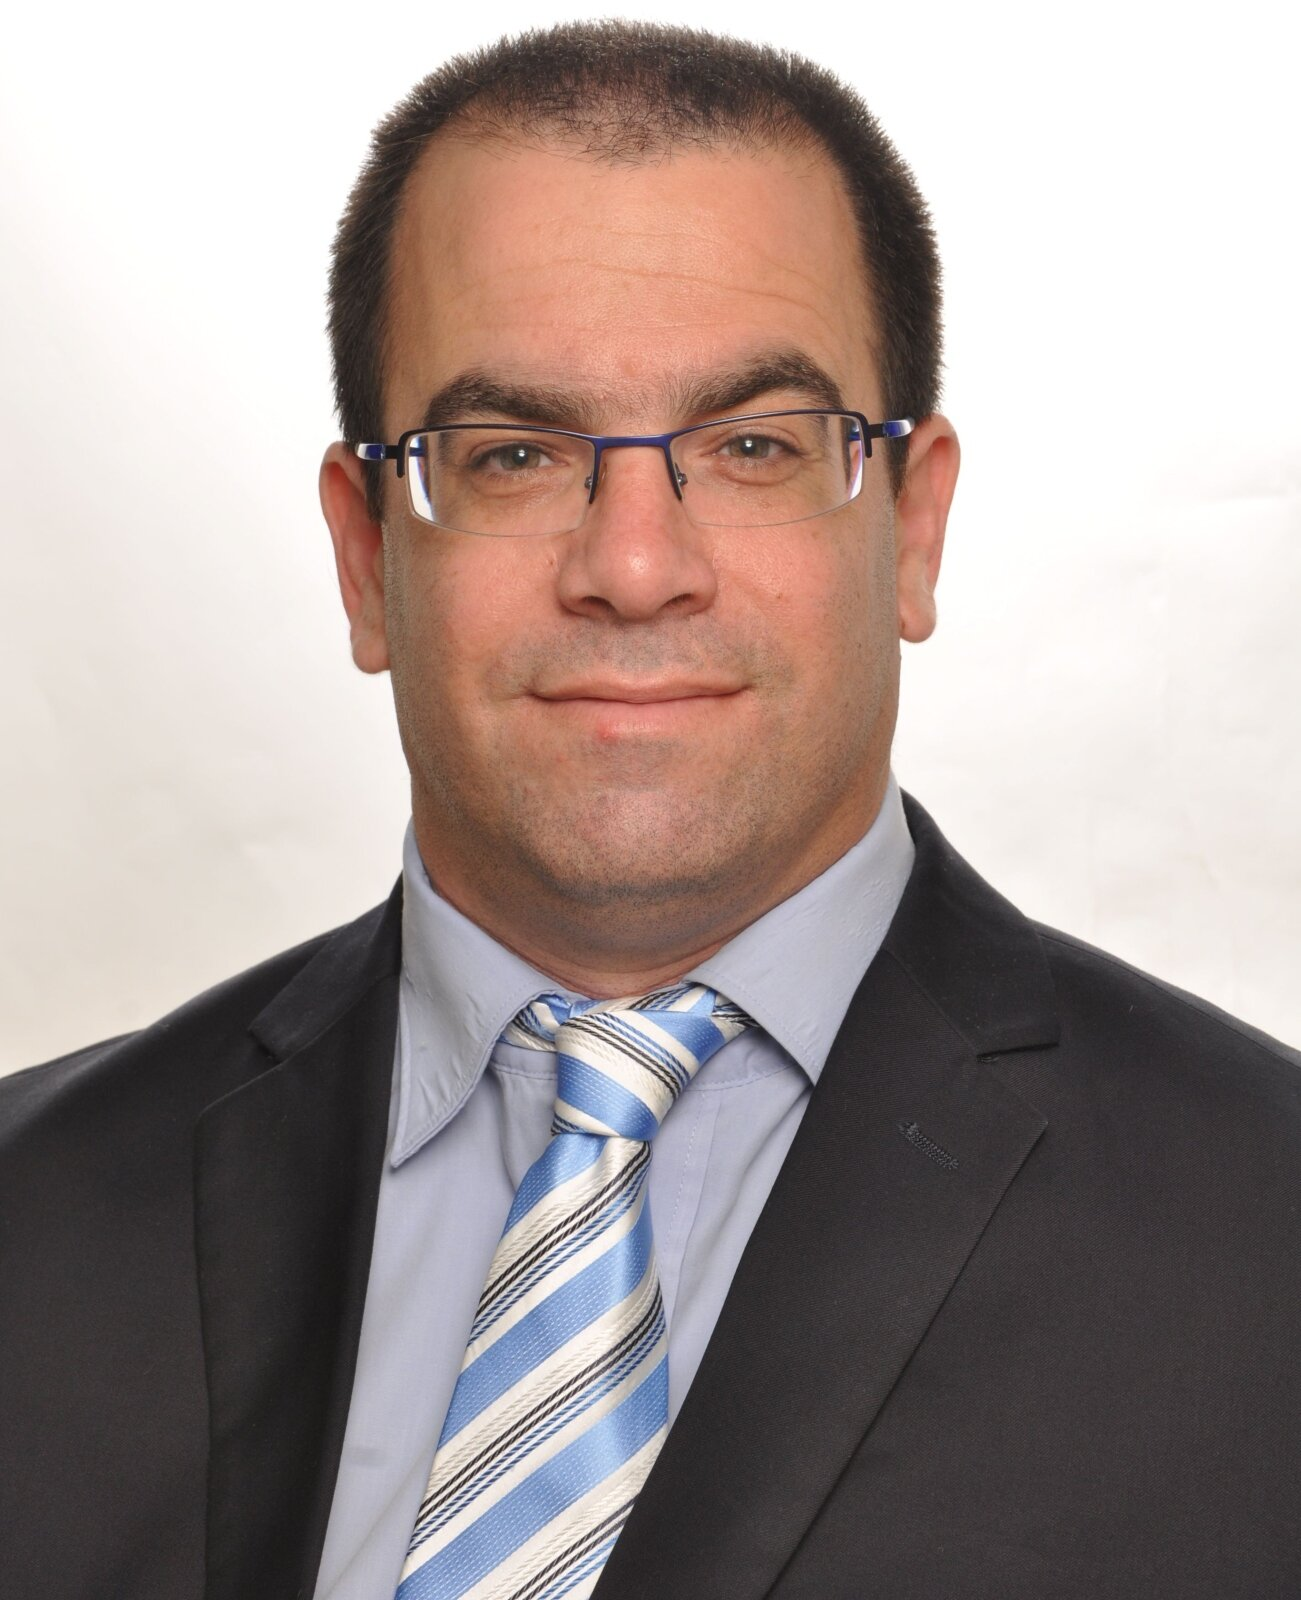 Vertical Field CEO Guy Elitzur. Photo: courtesy